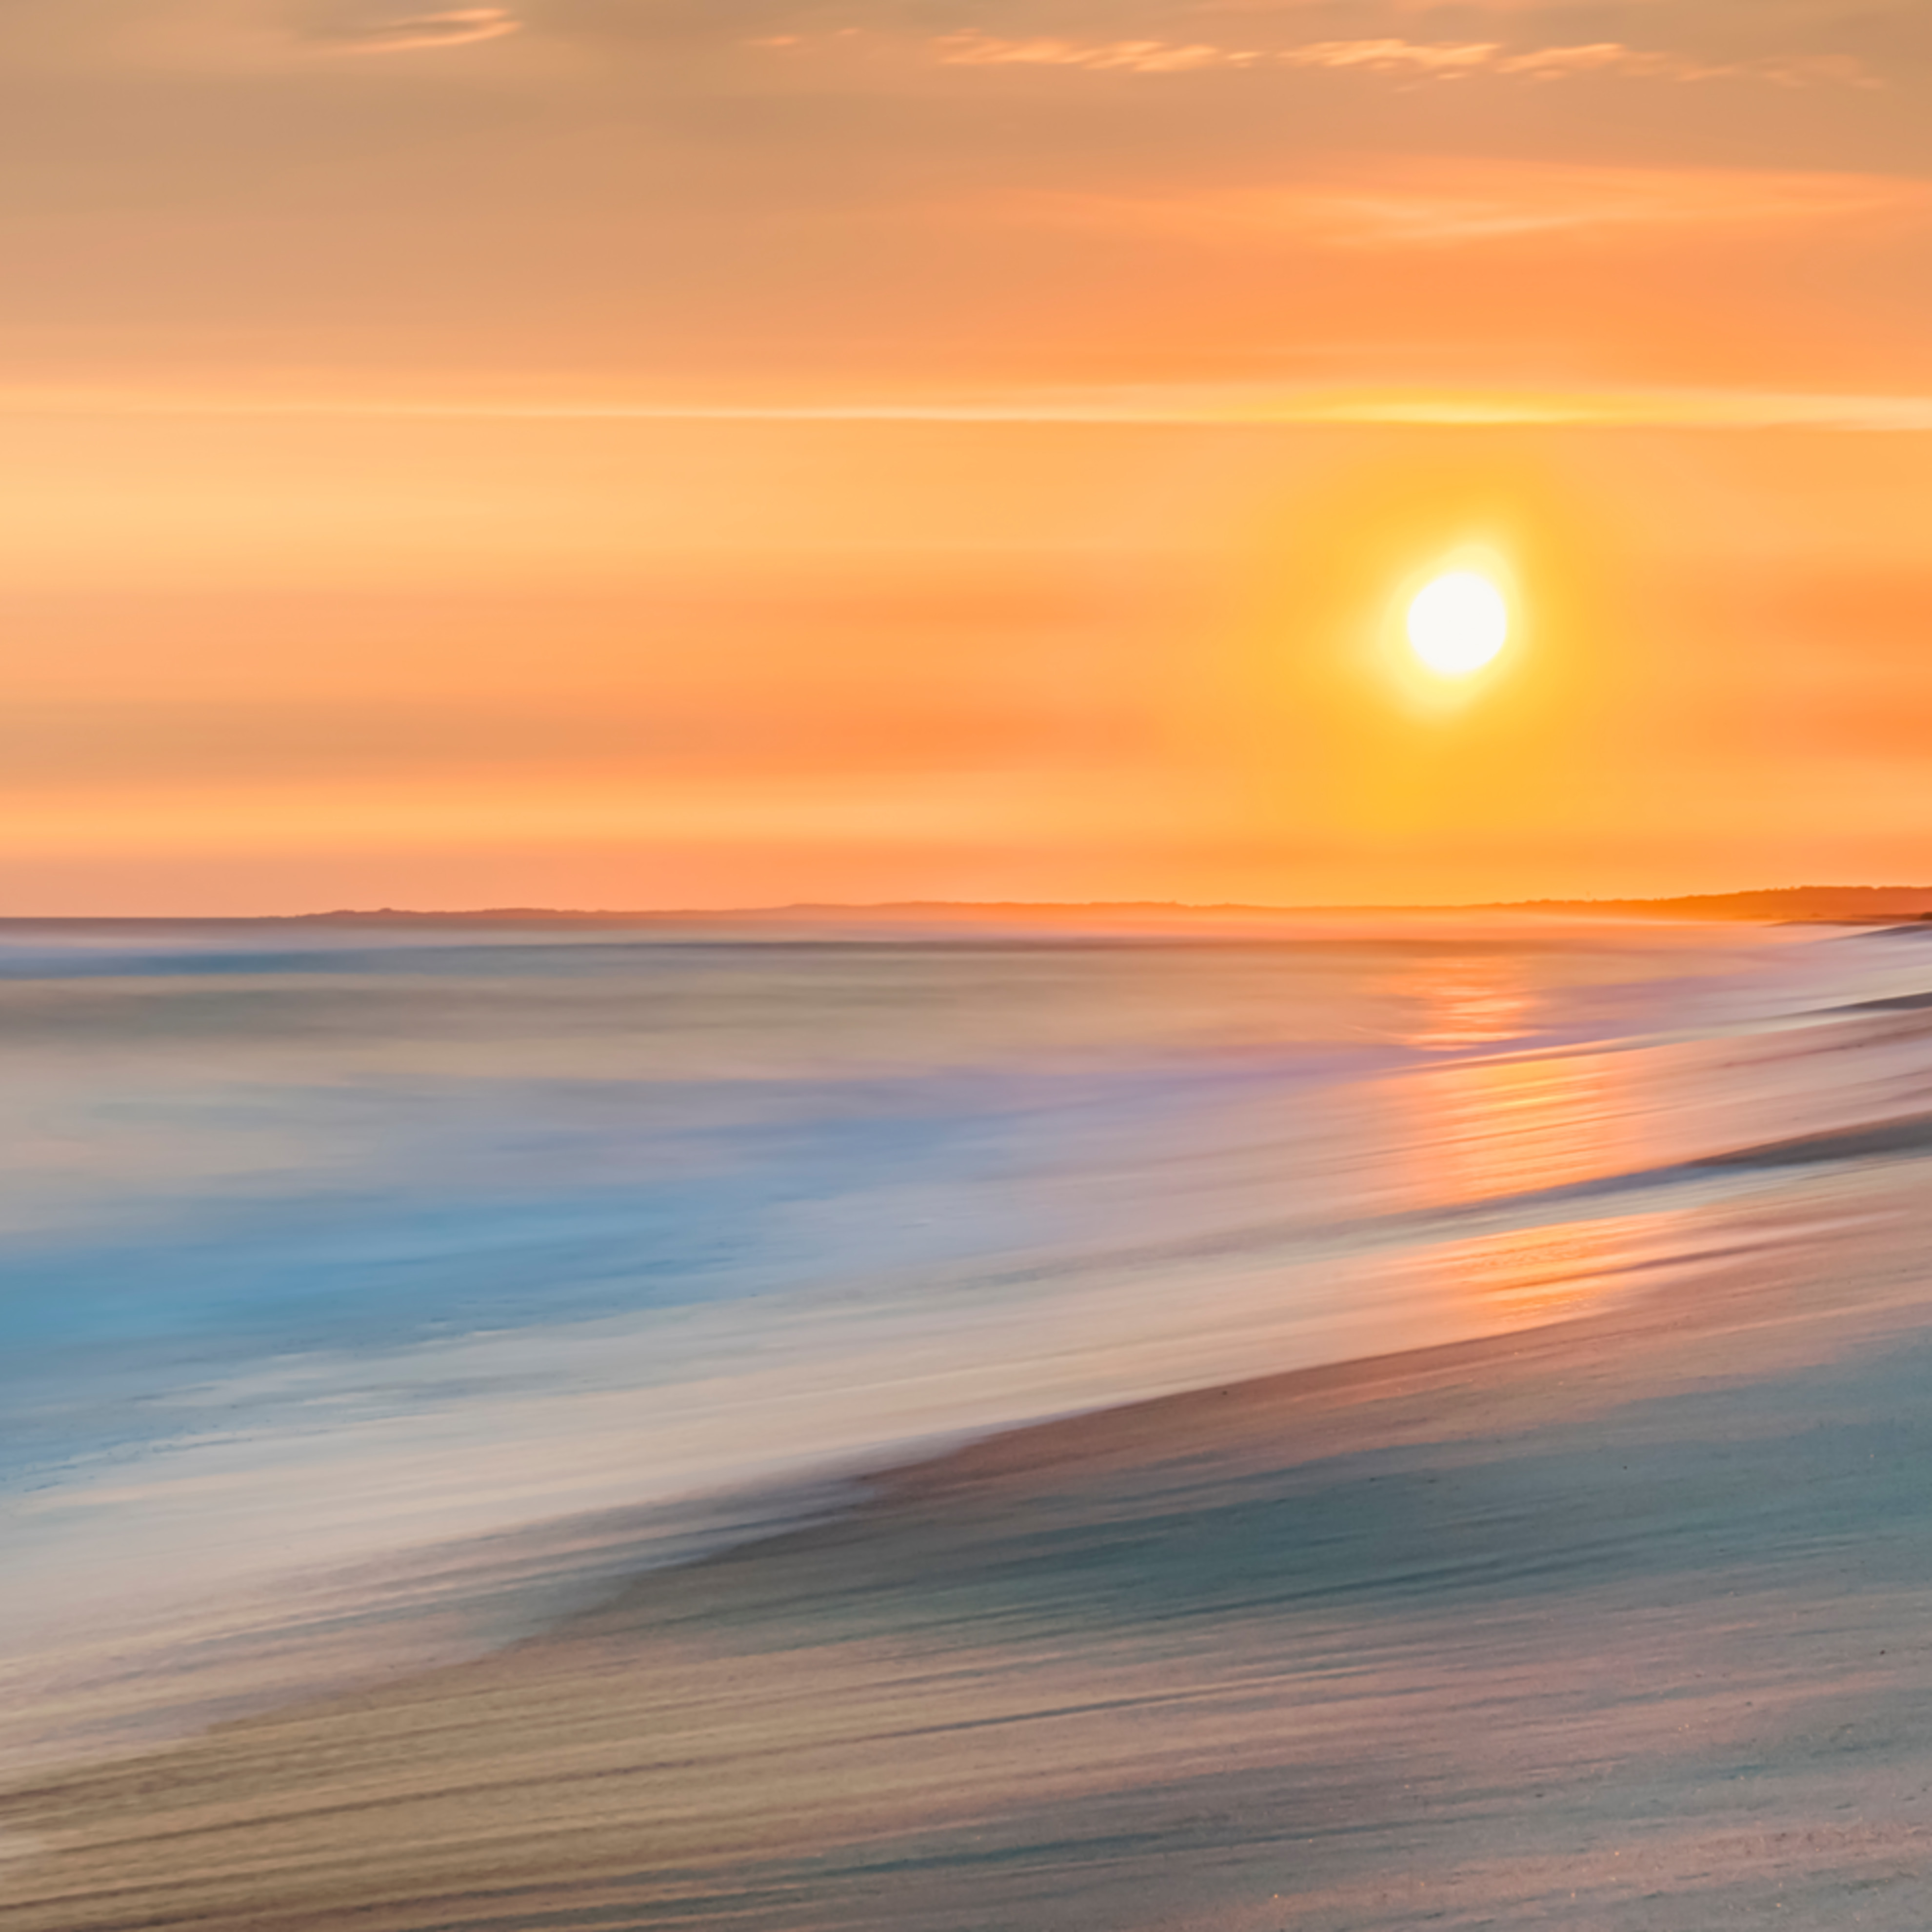 South beach soft sunset thbbyy